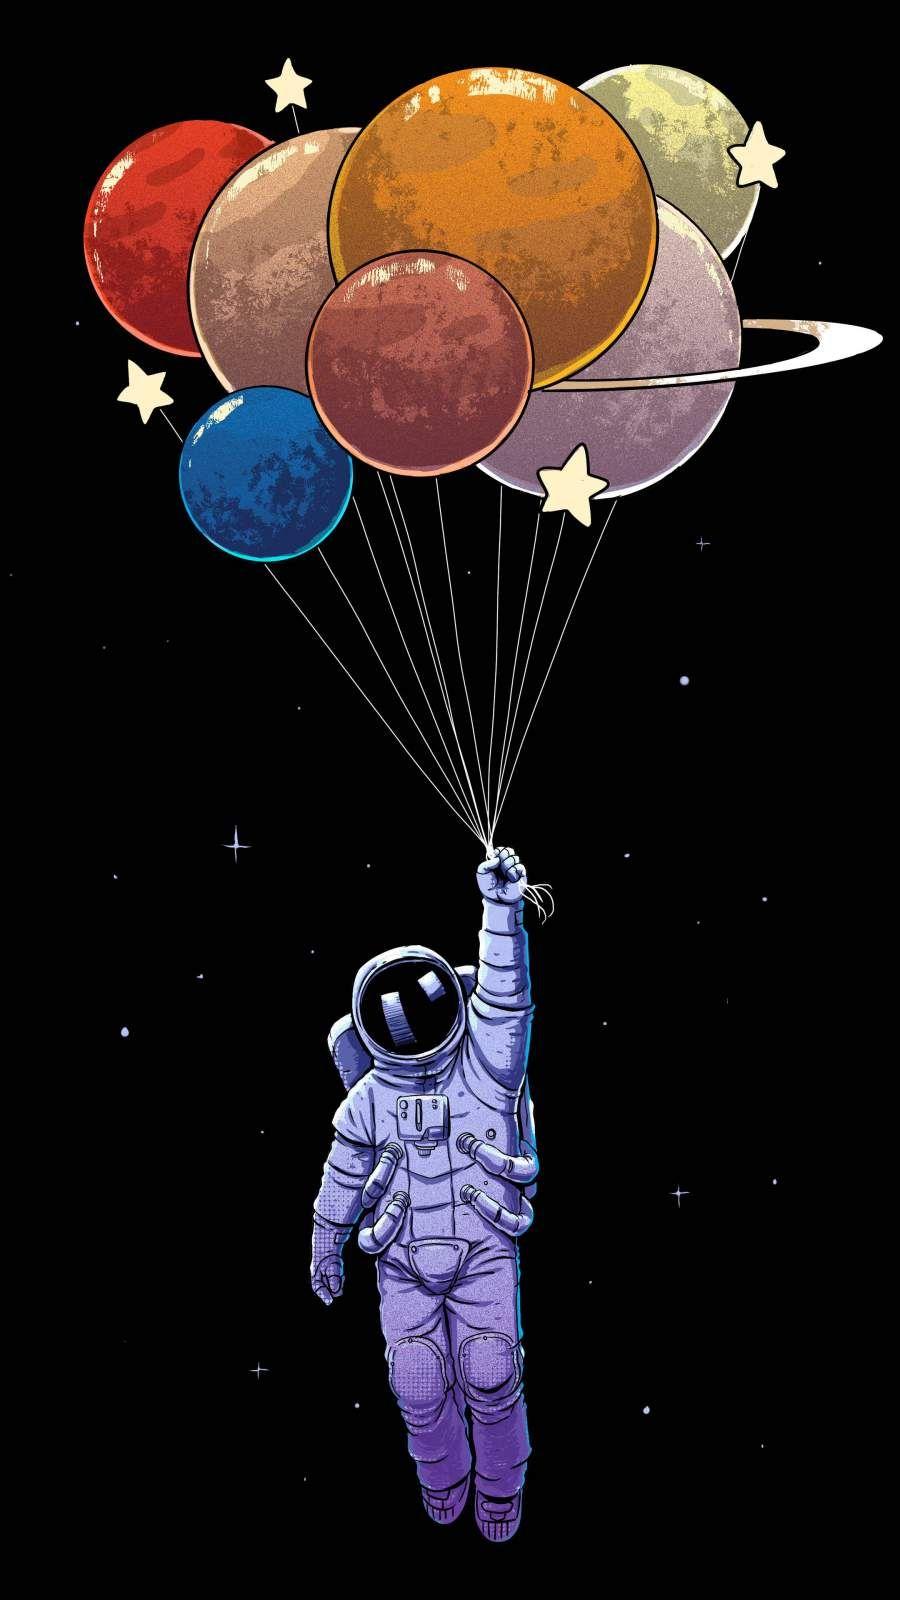 Space Exploration Iphone Wallpaper Pop Art Wallpaper Wallpaper Space Astronaut Art